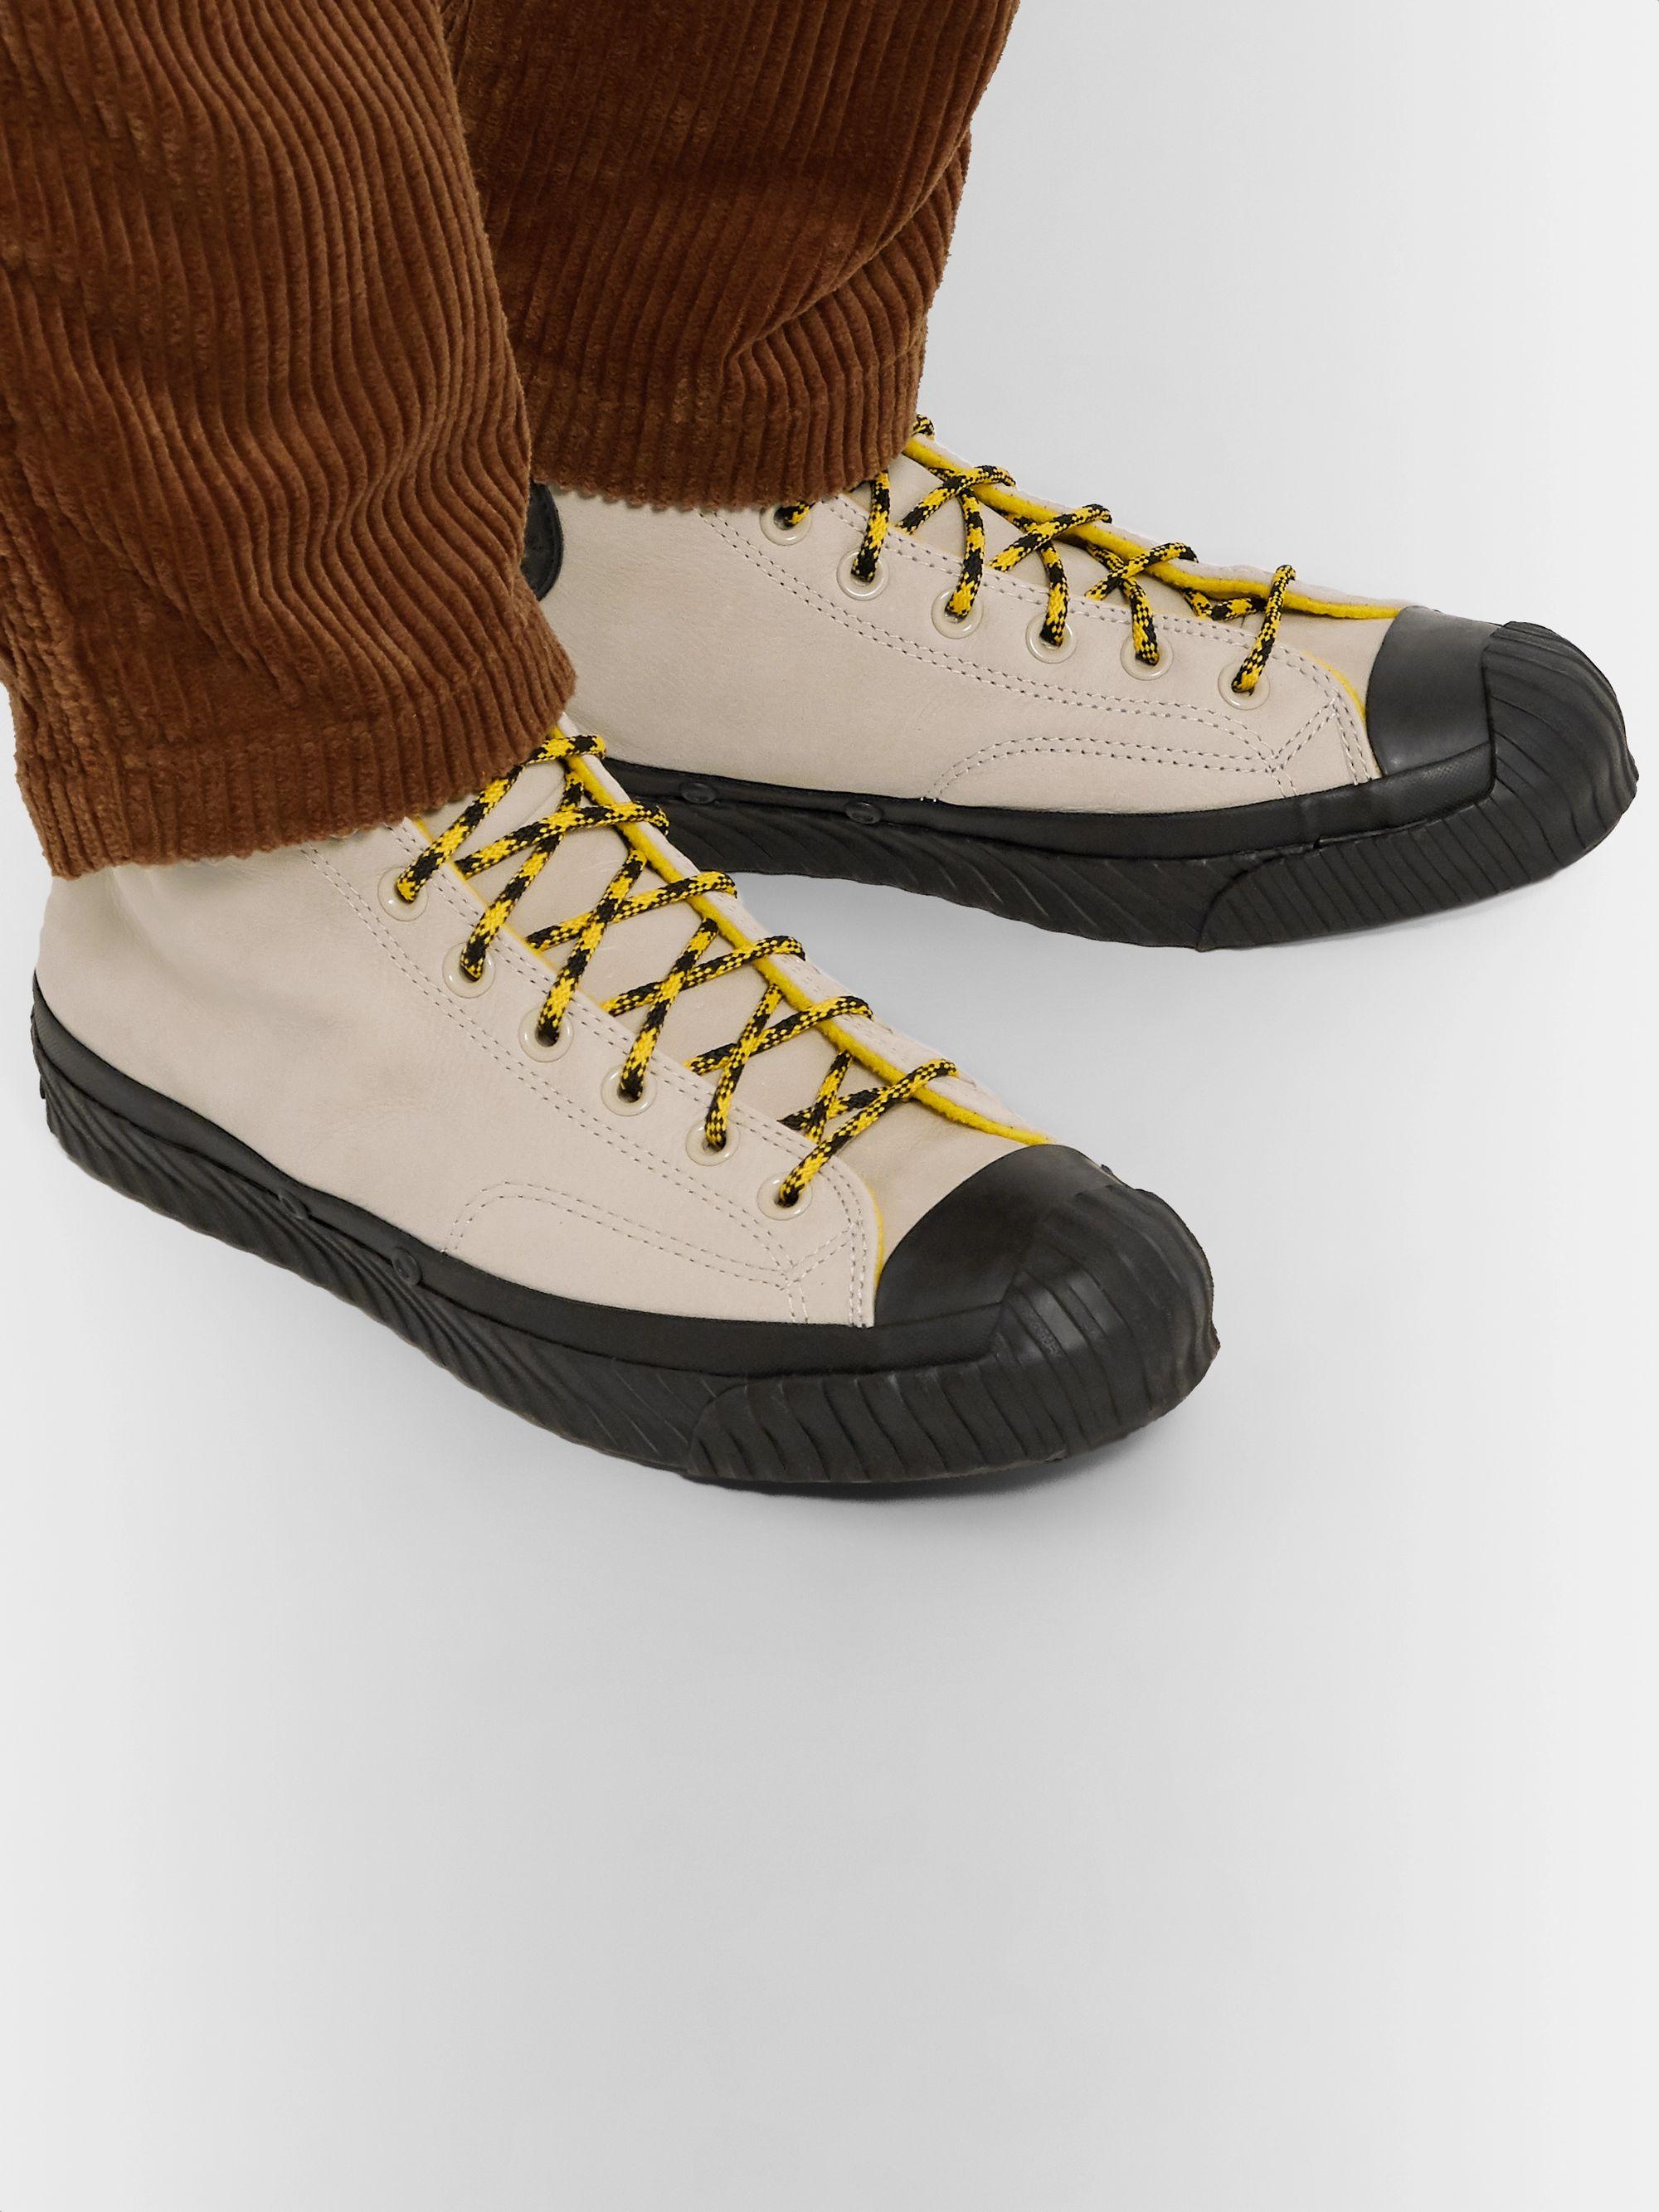 Bosey Chuck 70 Fleece Lined Nubuck High Top Sneakers